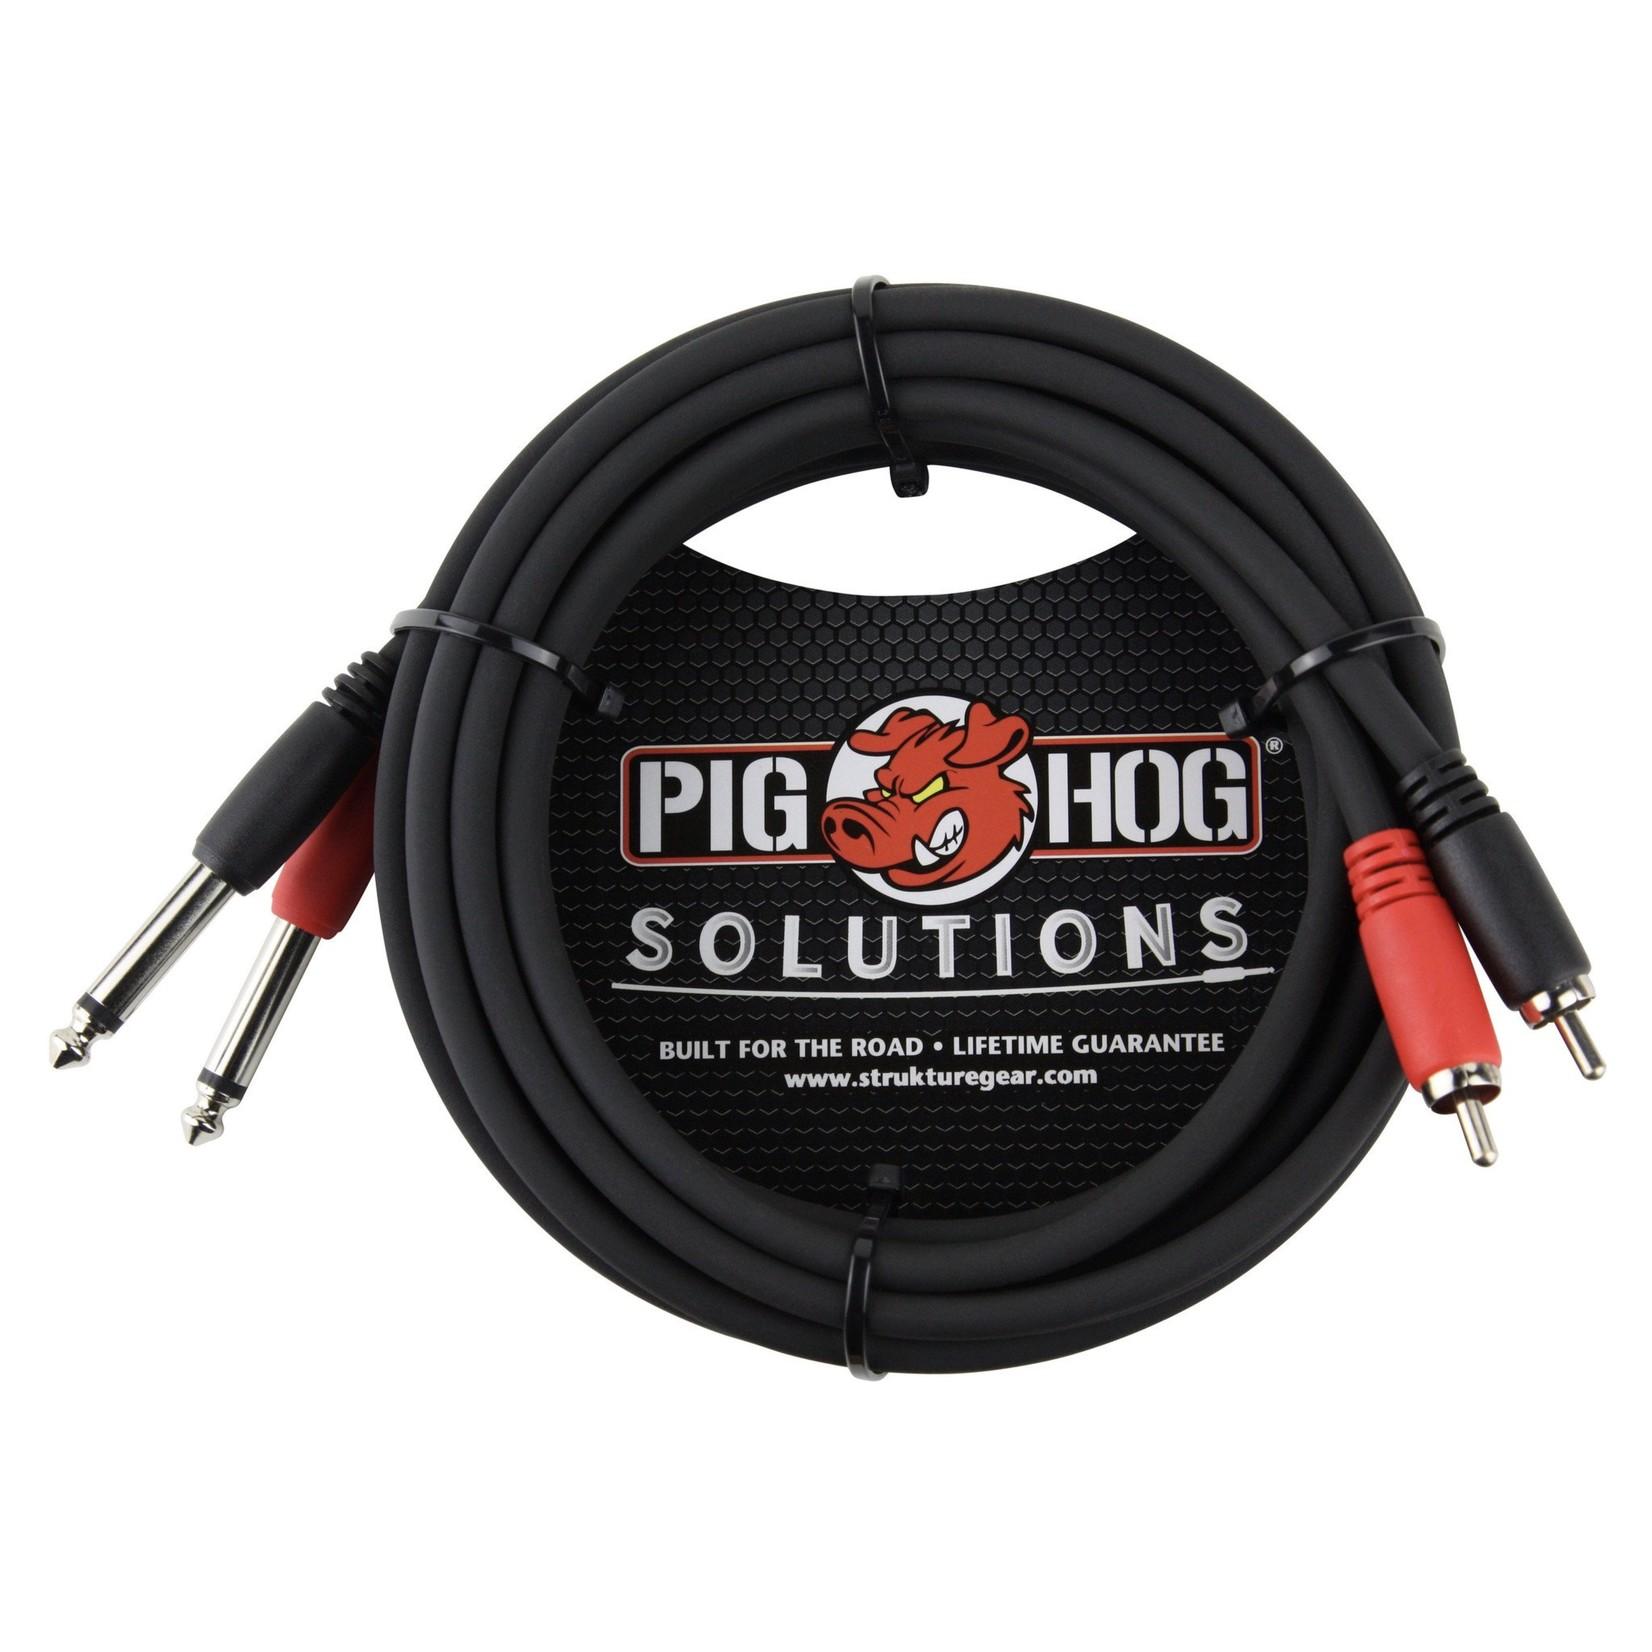 "Pig Hog Pig Hog Solutions - 10FT RCA to 1/4"" TS Dual Cable, PD-R1410"